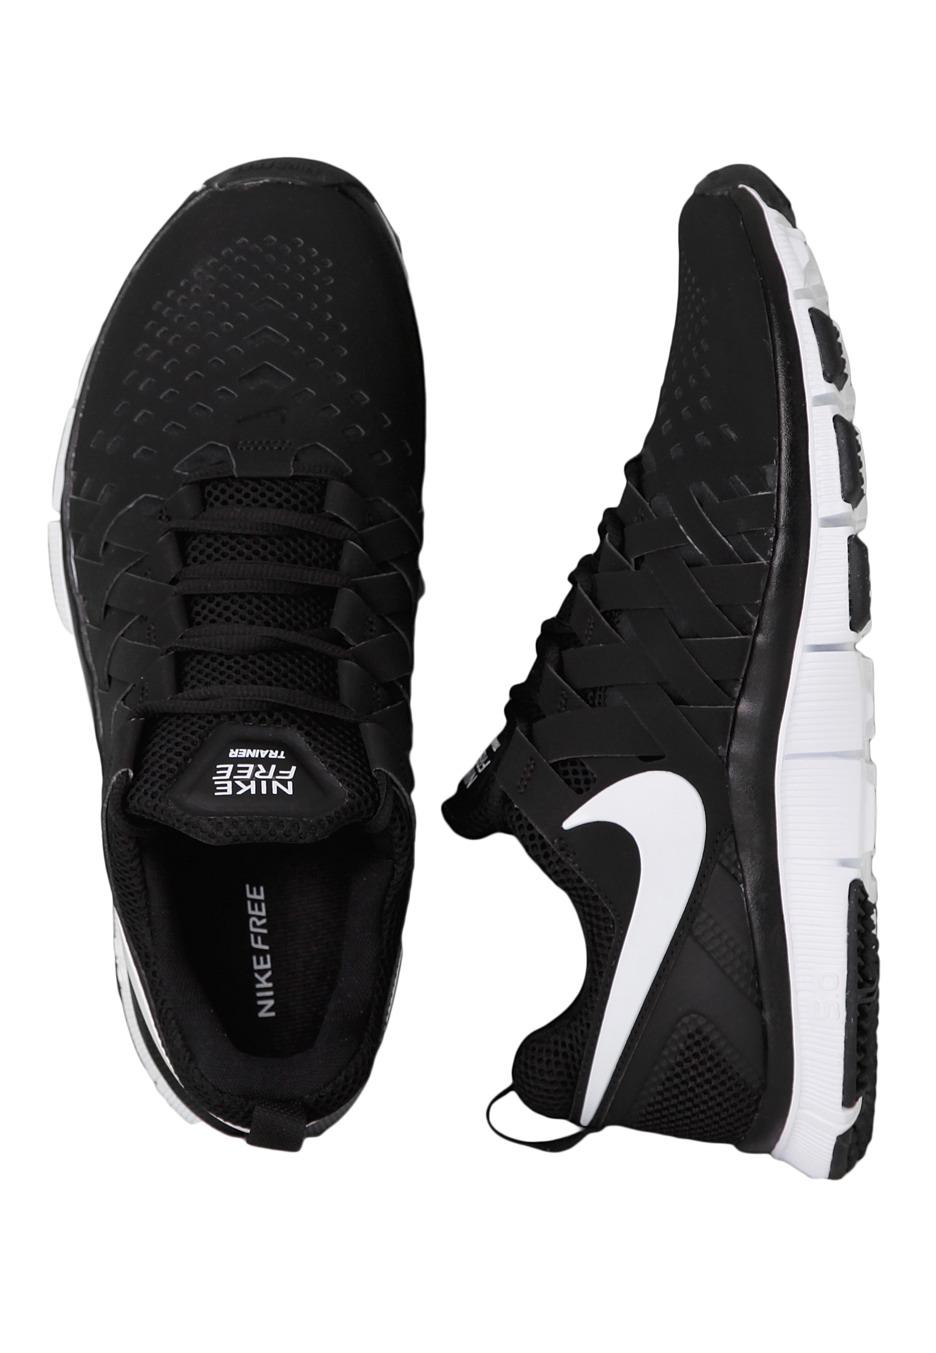 Nike - Free Trainer 5.0 Black White Black - Shoes - Impericon.com Worldwide 1836ac80e